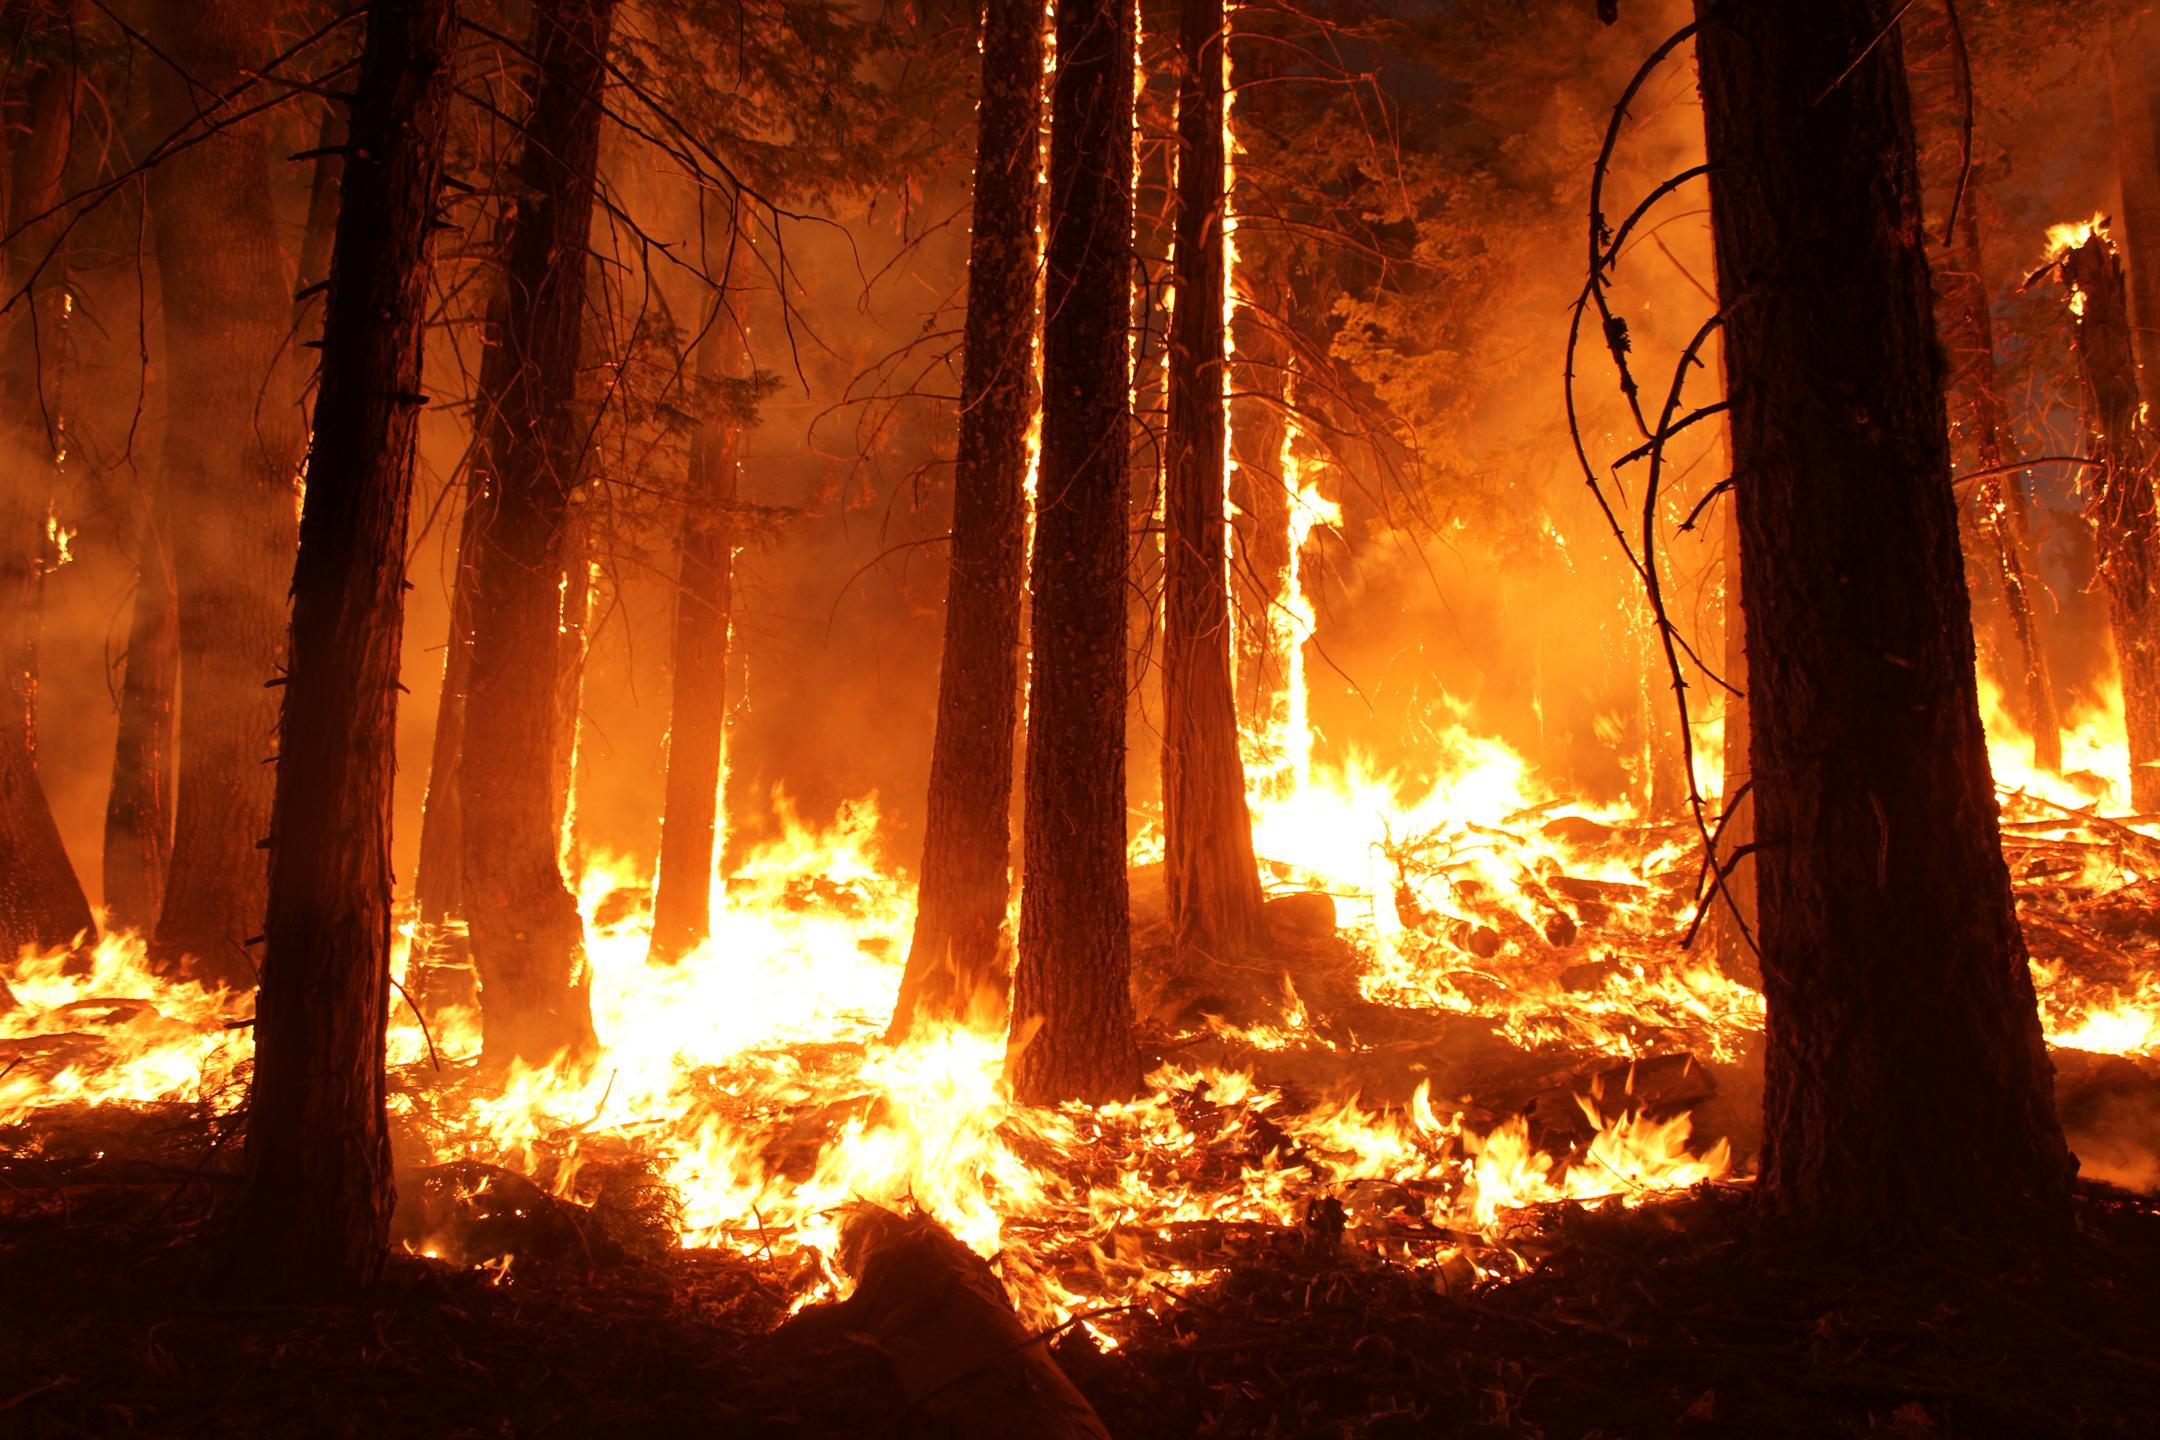 nasa forest fire ile ilgili görsel sonucu